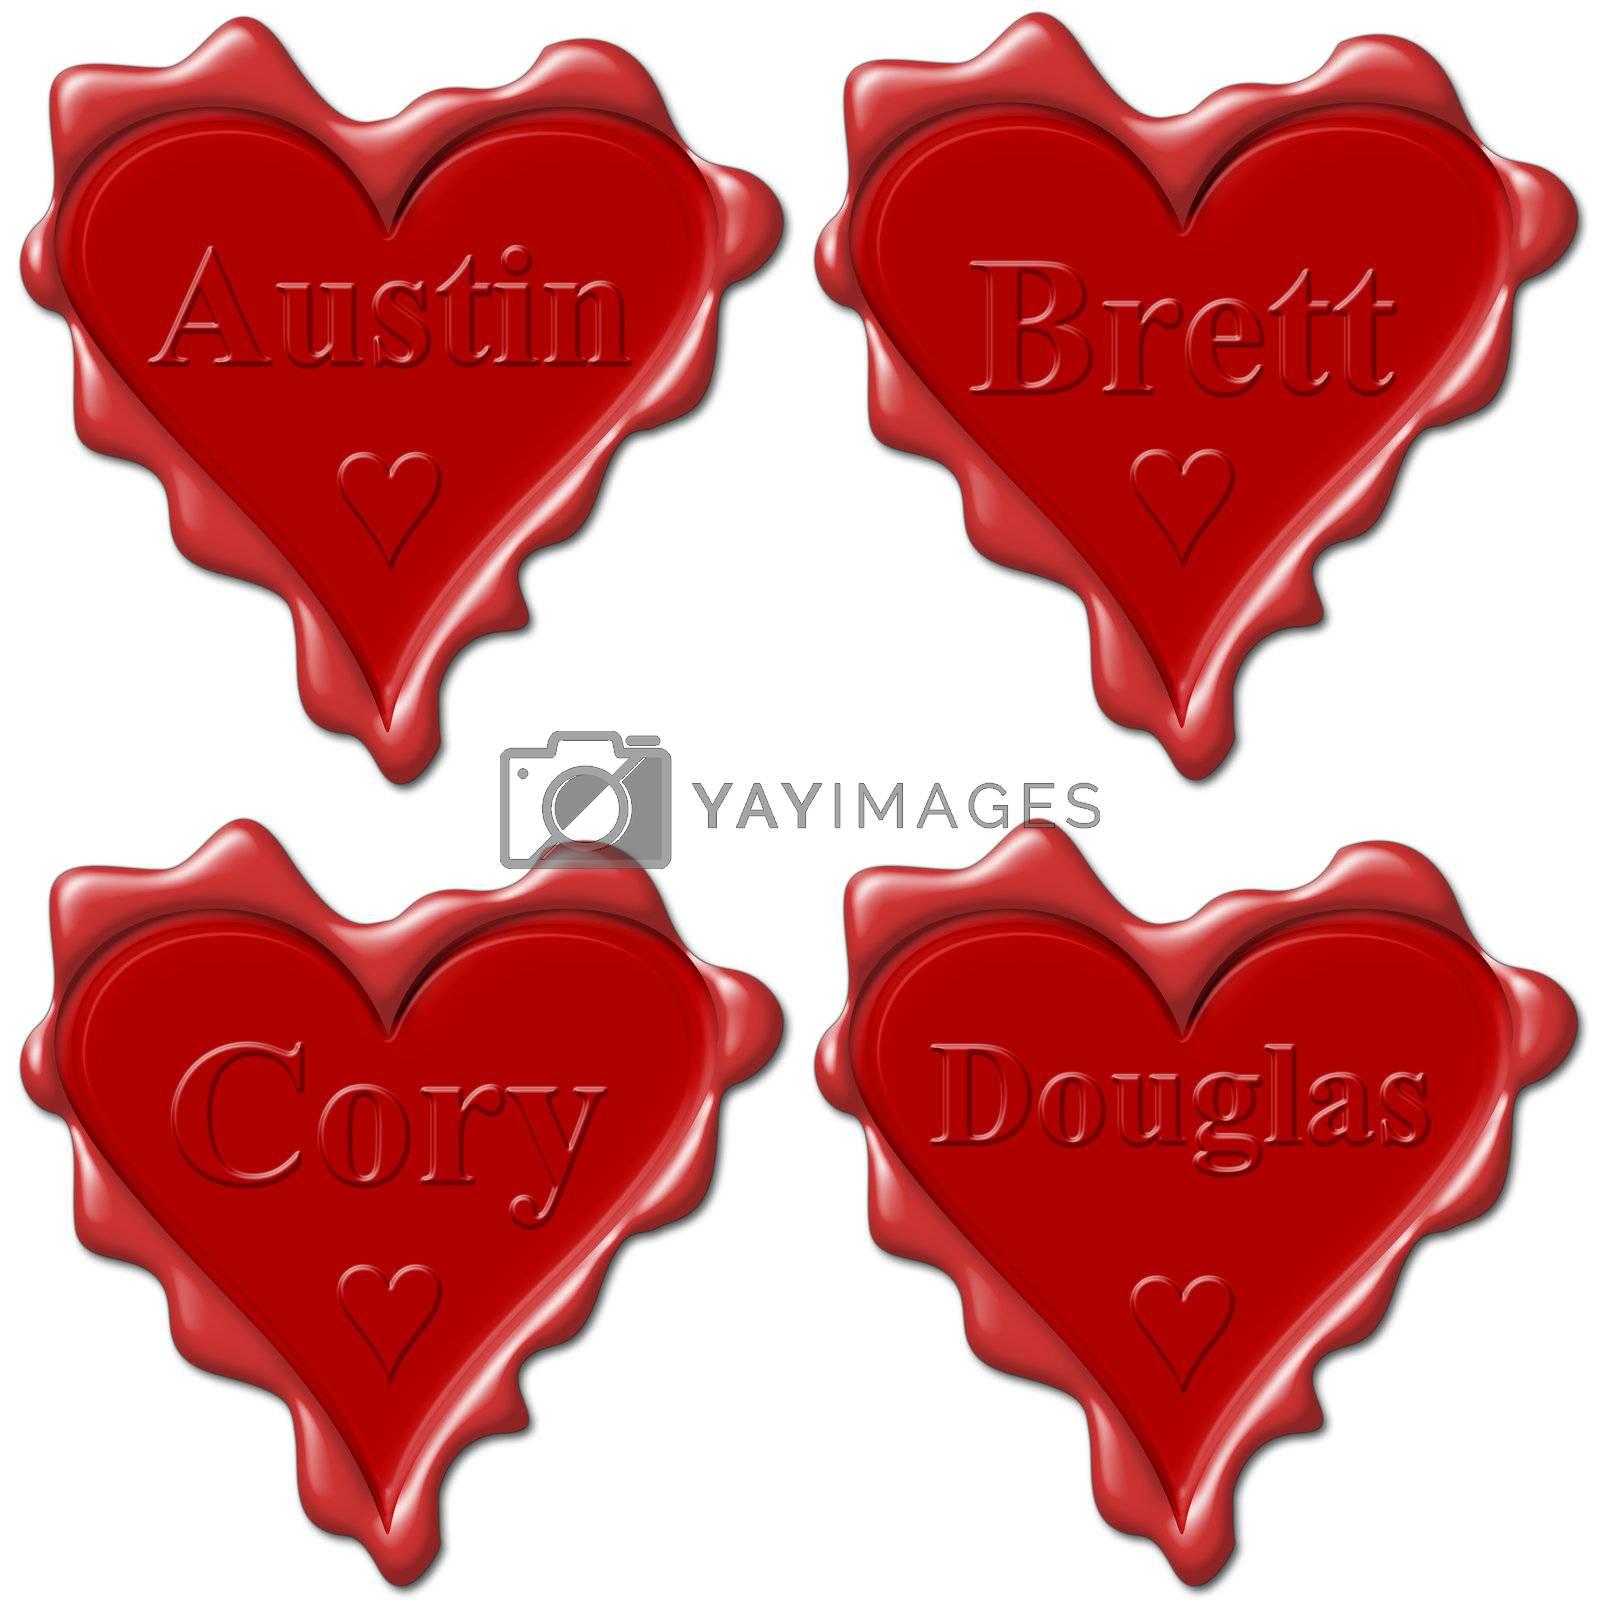 Valentine love hearts with names: Austin, Brett, Cory, Douglas